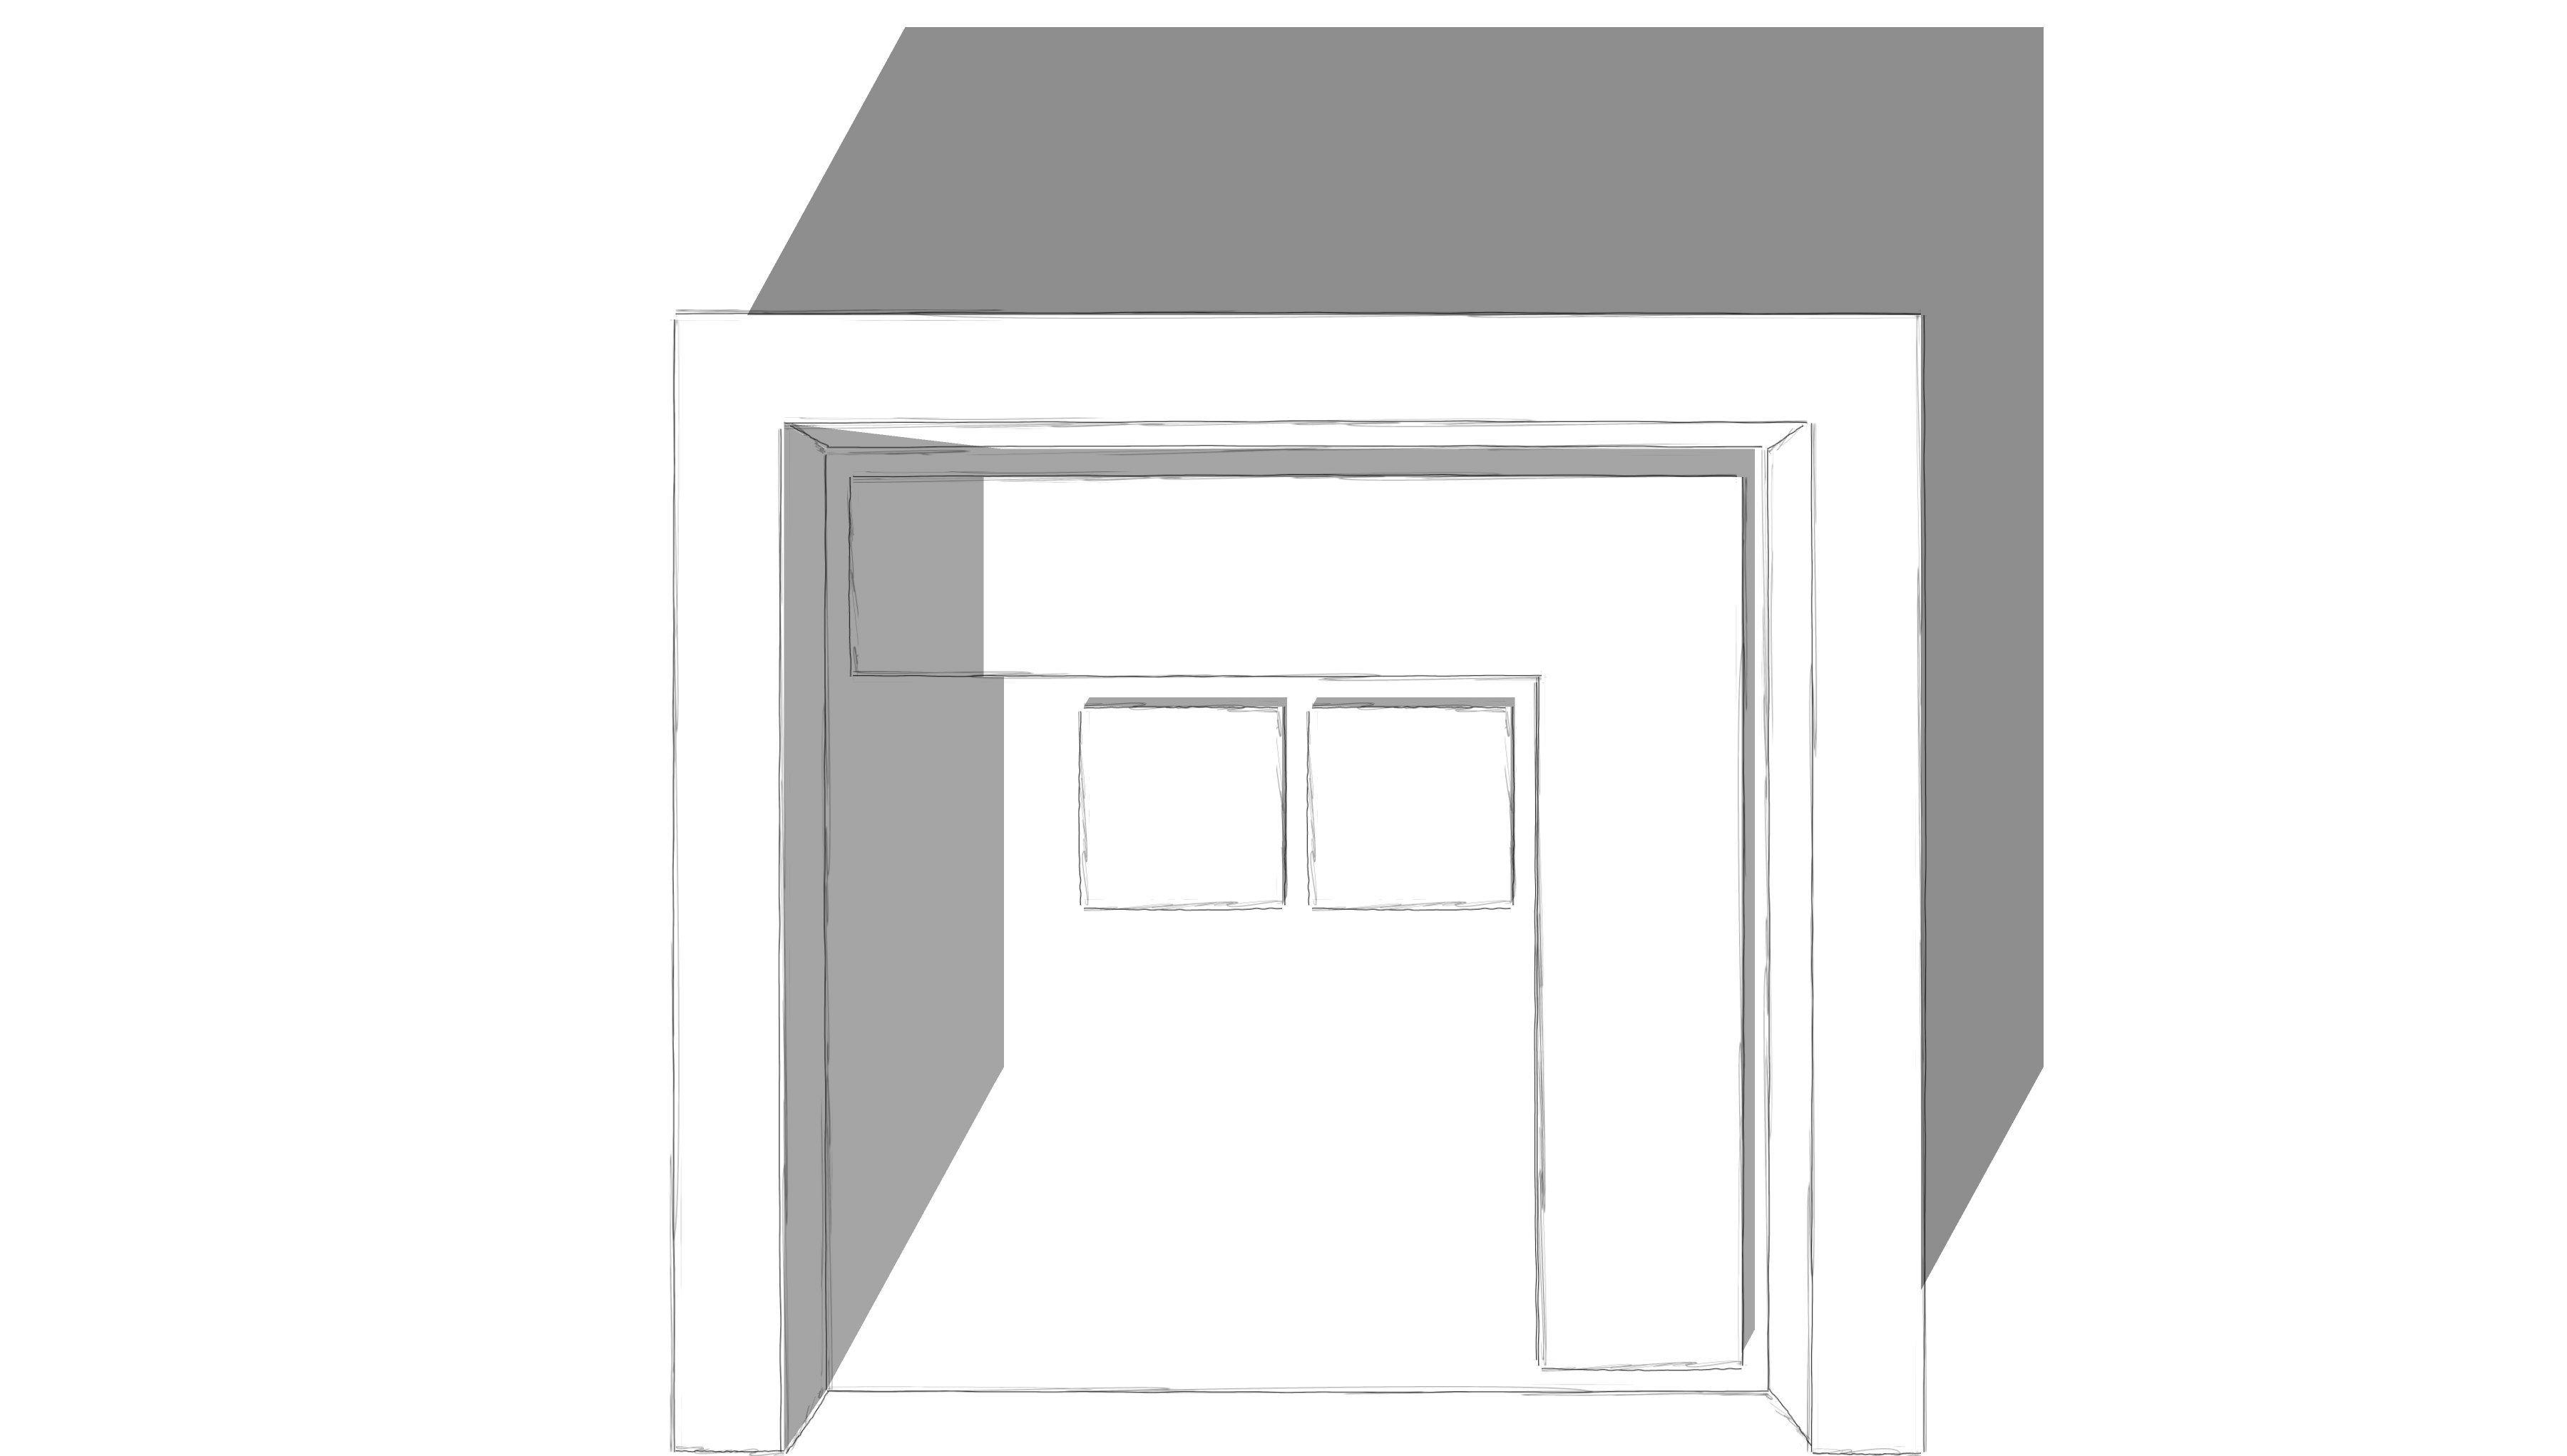 Sitzplatz aus Grossformatplatten